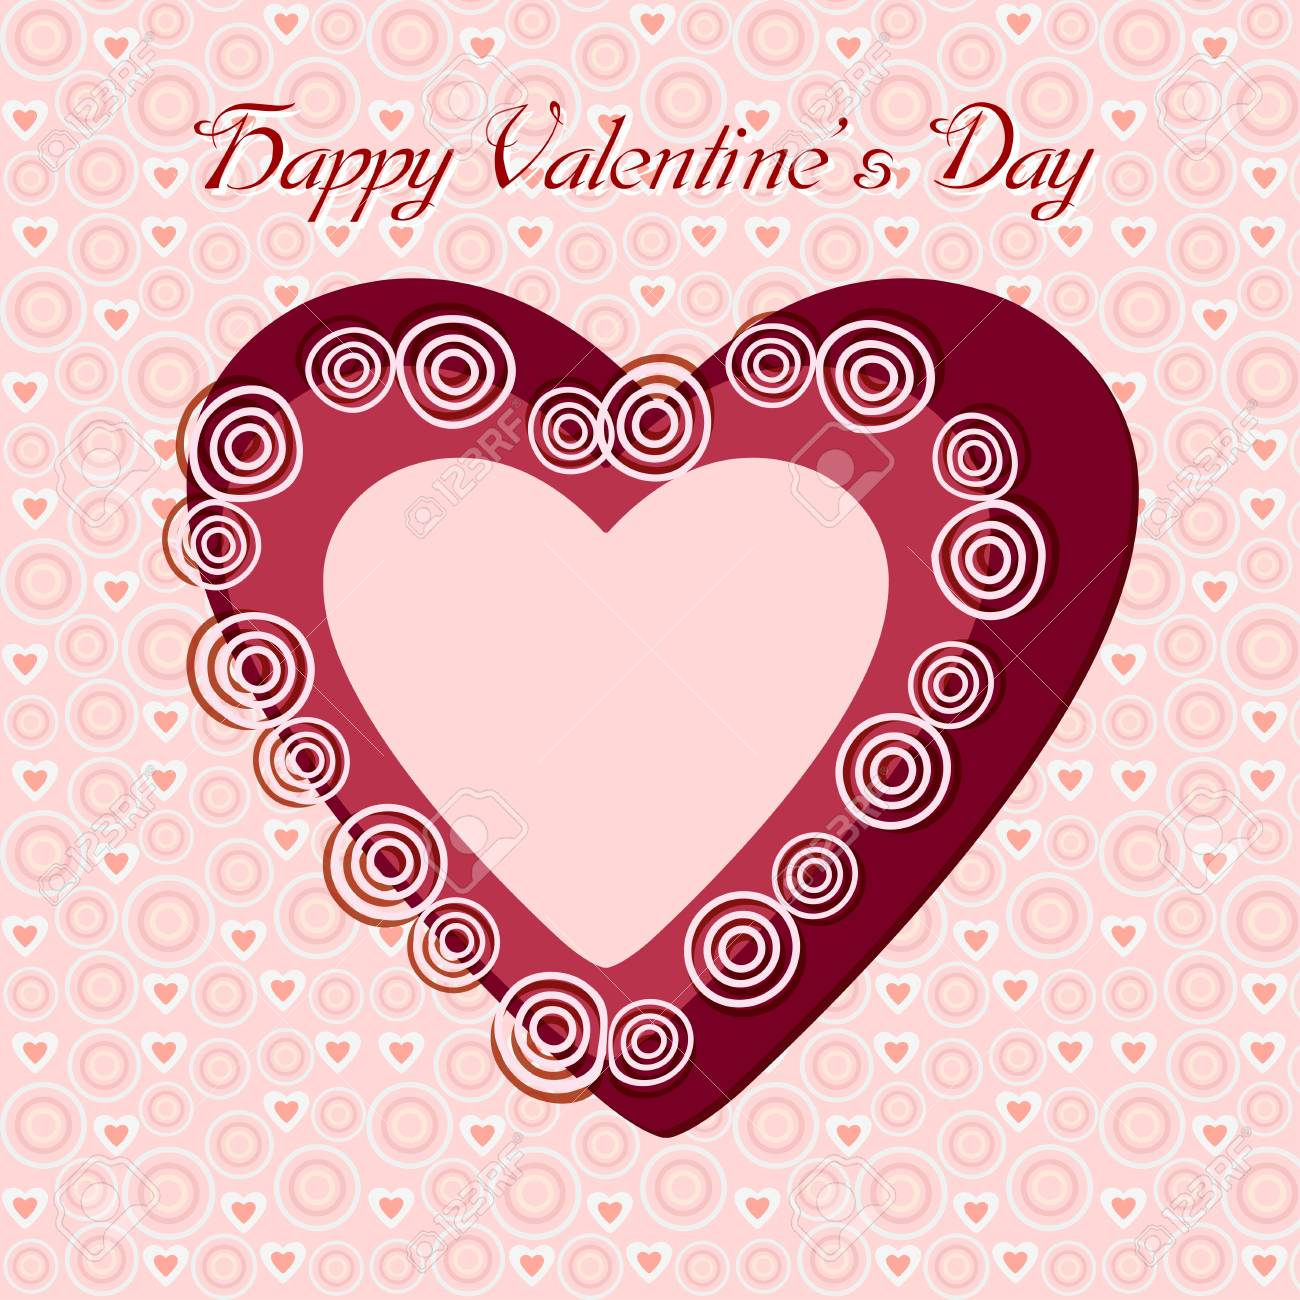 Heart Valentine s day Stock Vector - 17301212